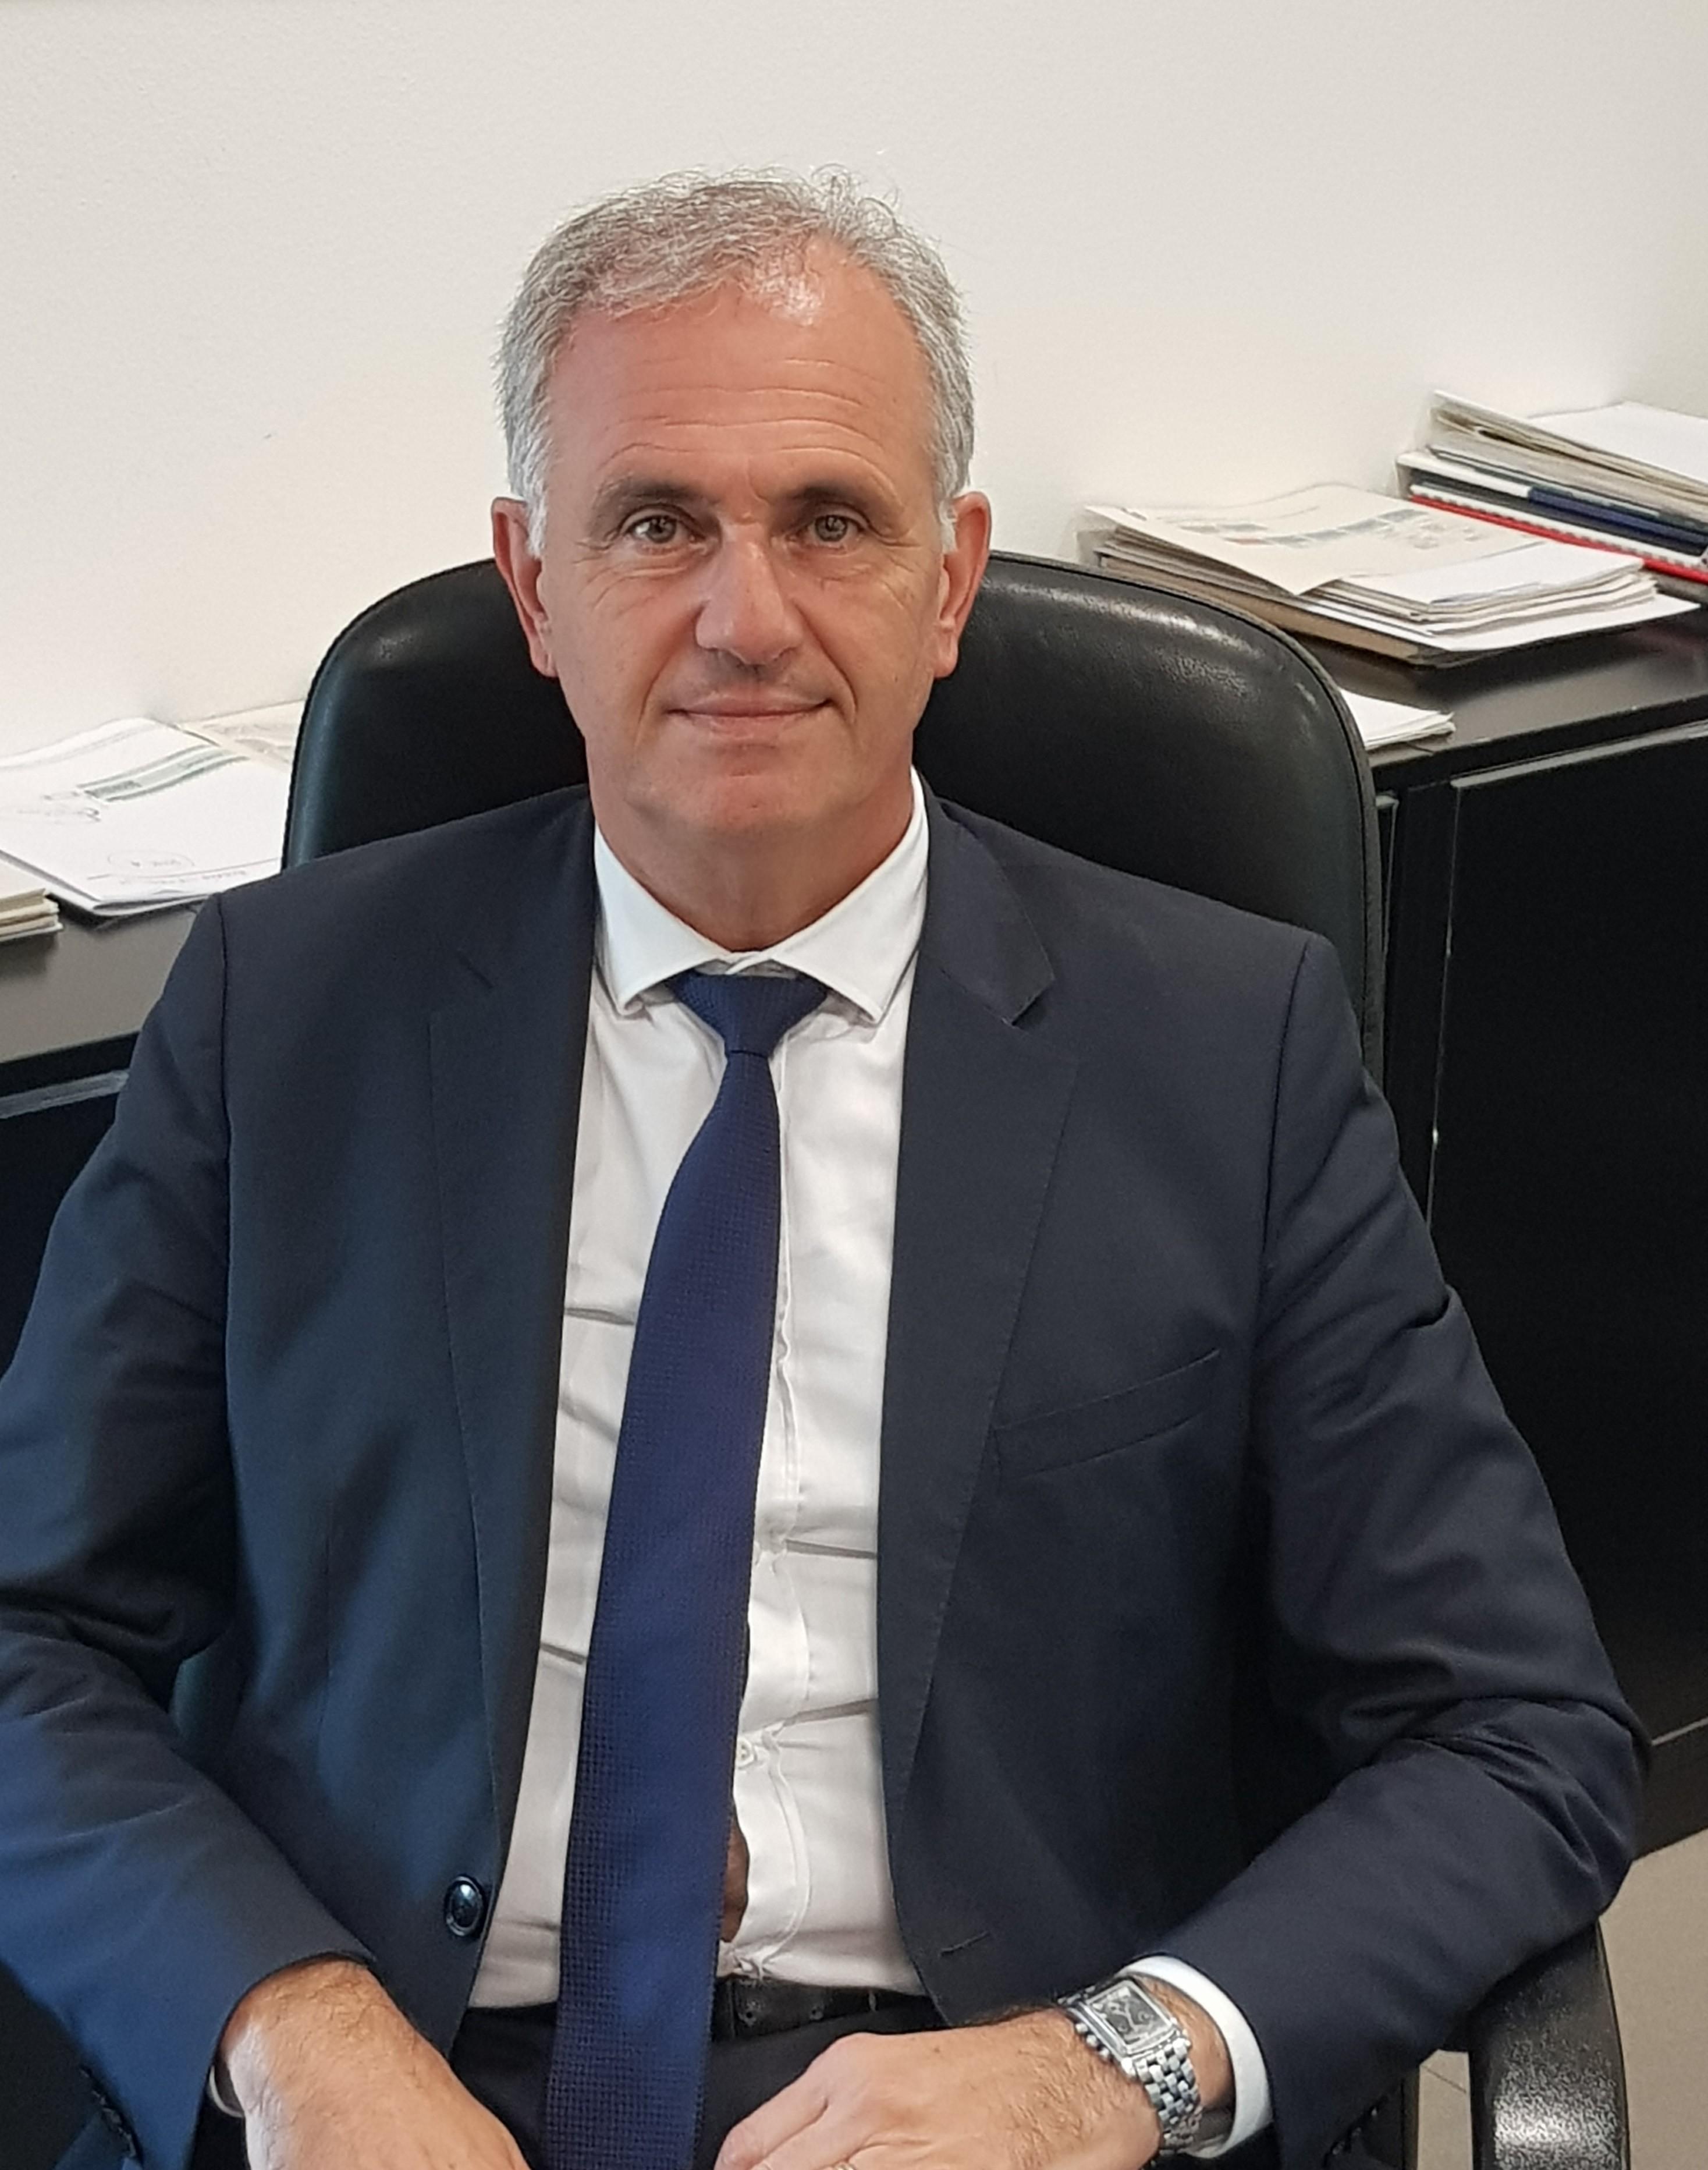 Simone Pasquini nuovo direttore generale di Mps Leasing & Factoring